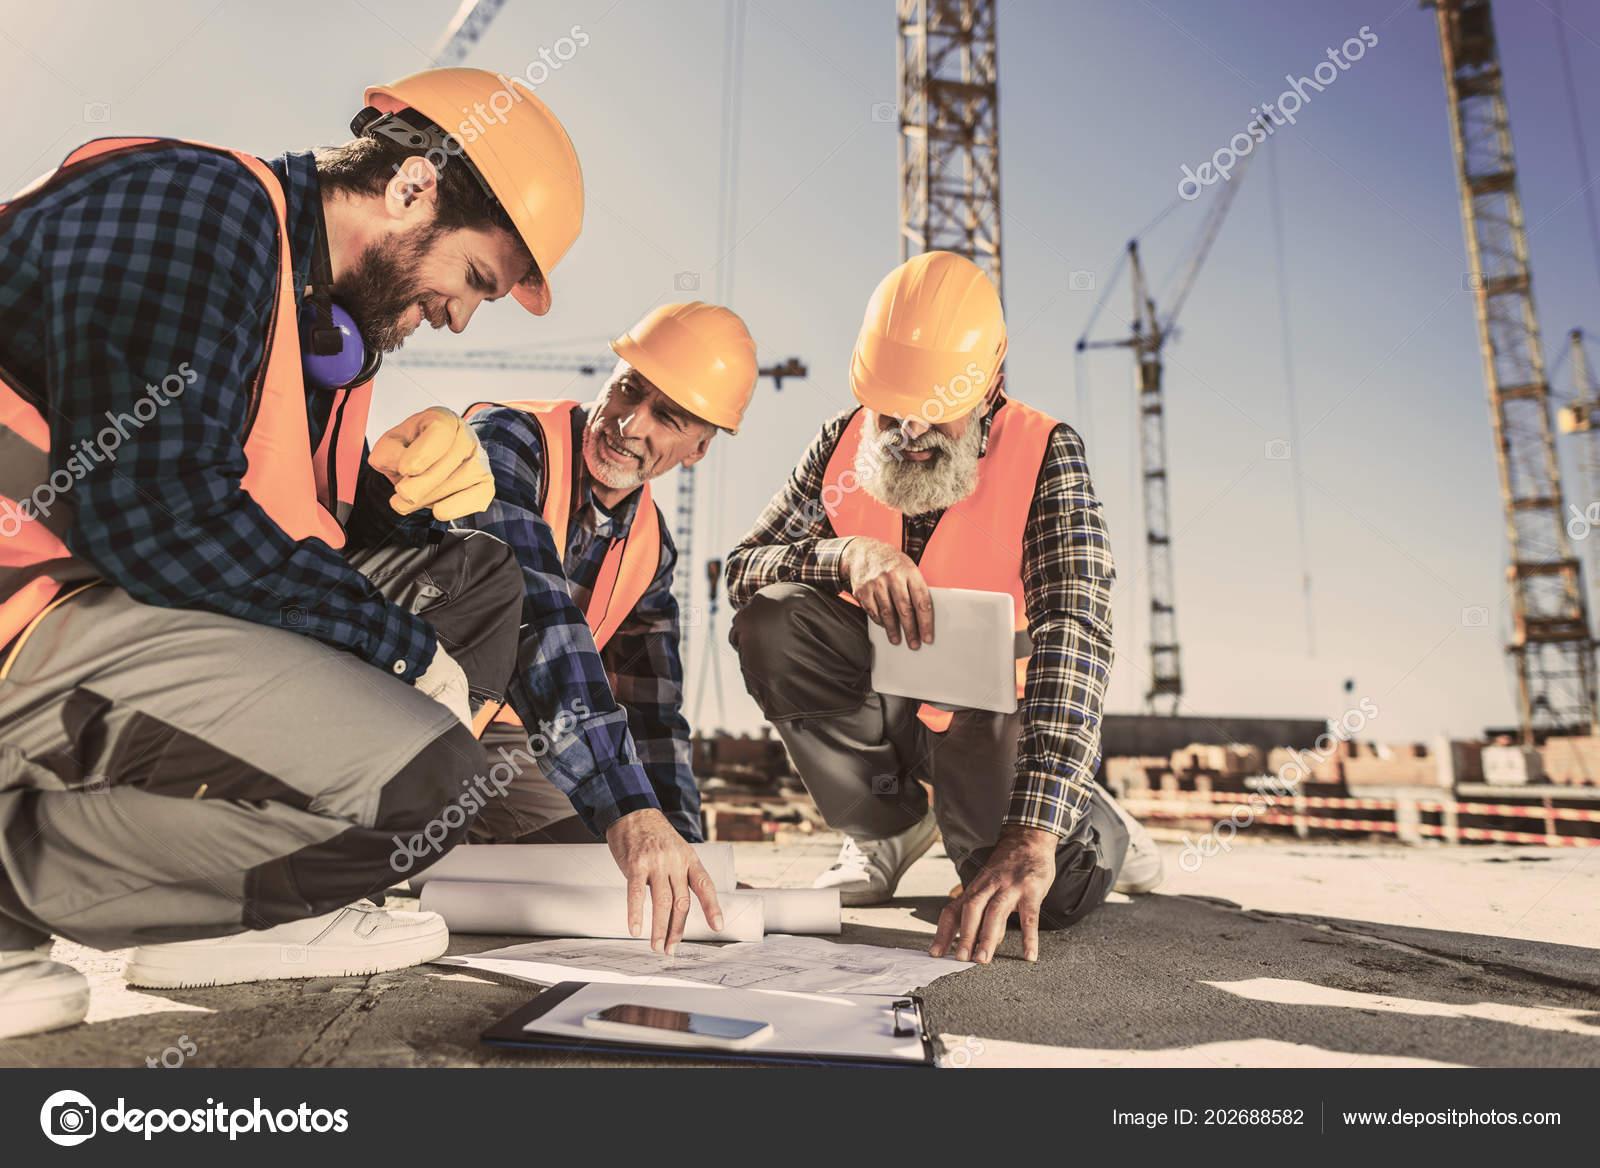 95aa1de3fb606 Construction Workers Sitting Concrete Construction Site Looking Building  Plans– stock image